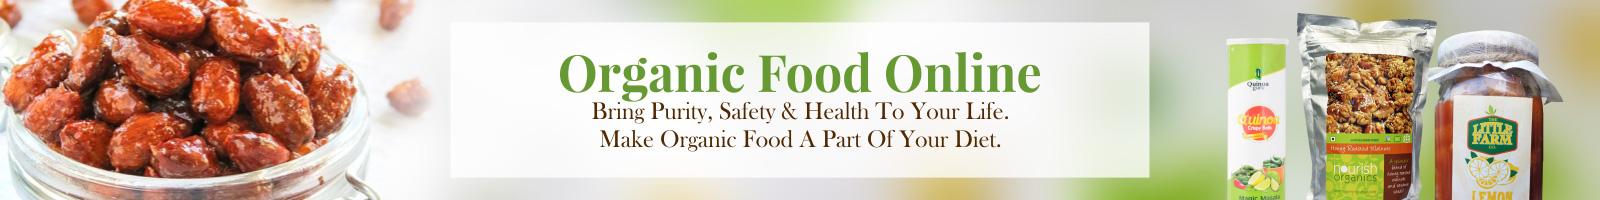 Organic-Food-Online